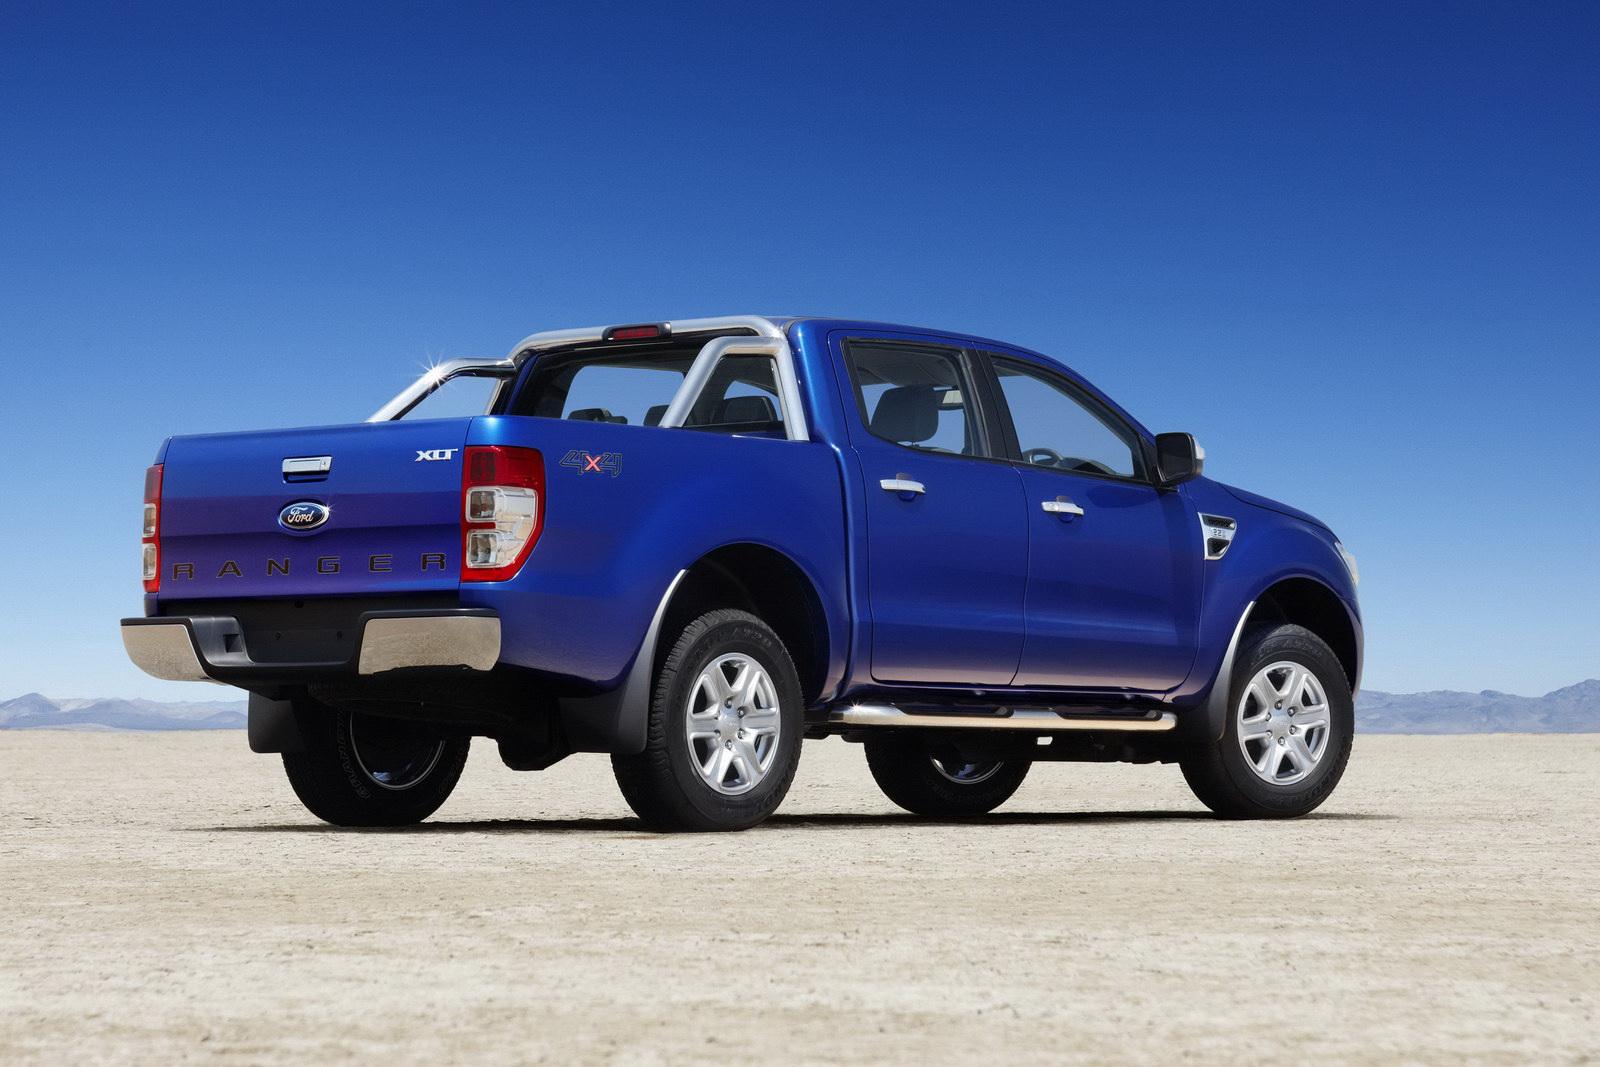 Auto Blog: Fotos do Carro do Ford Ranger